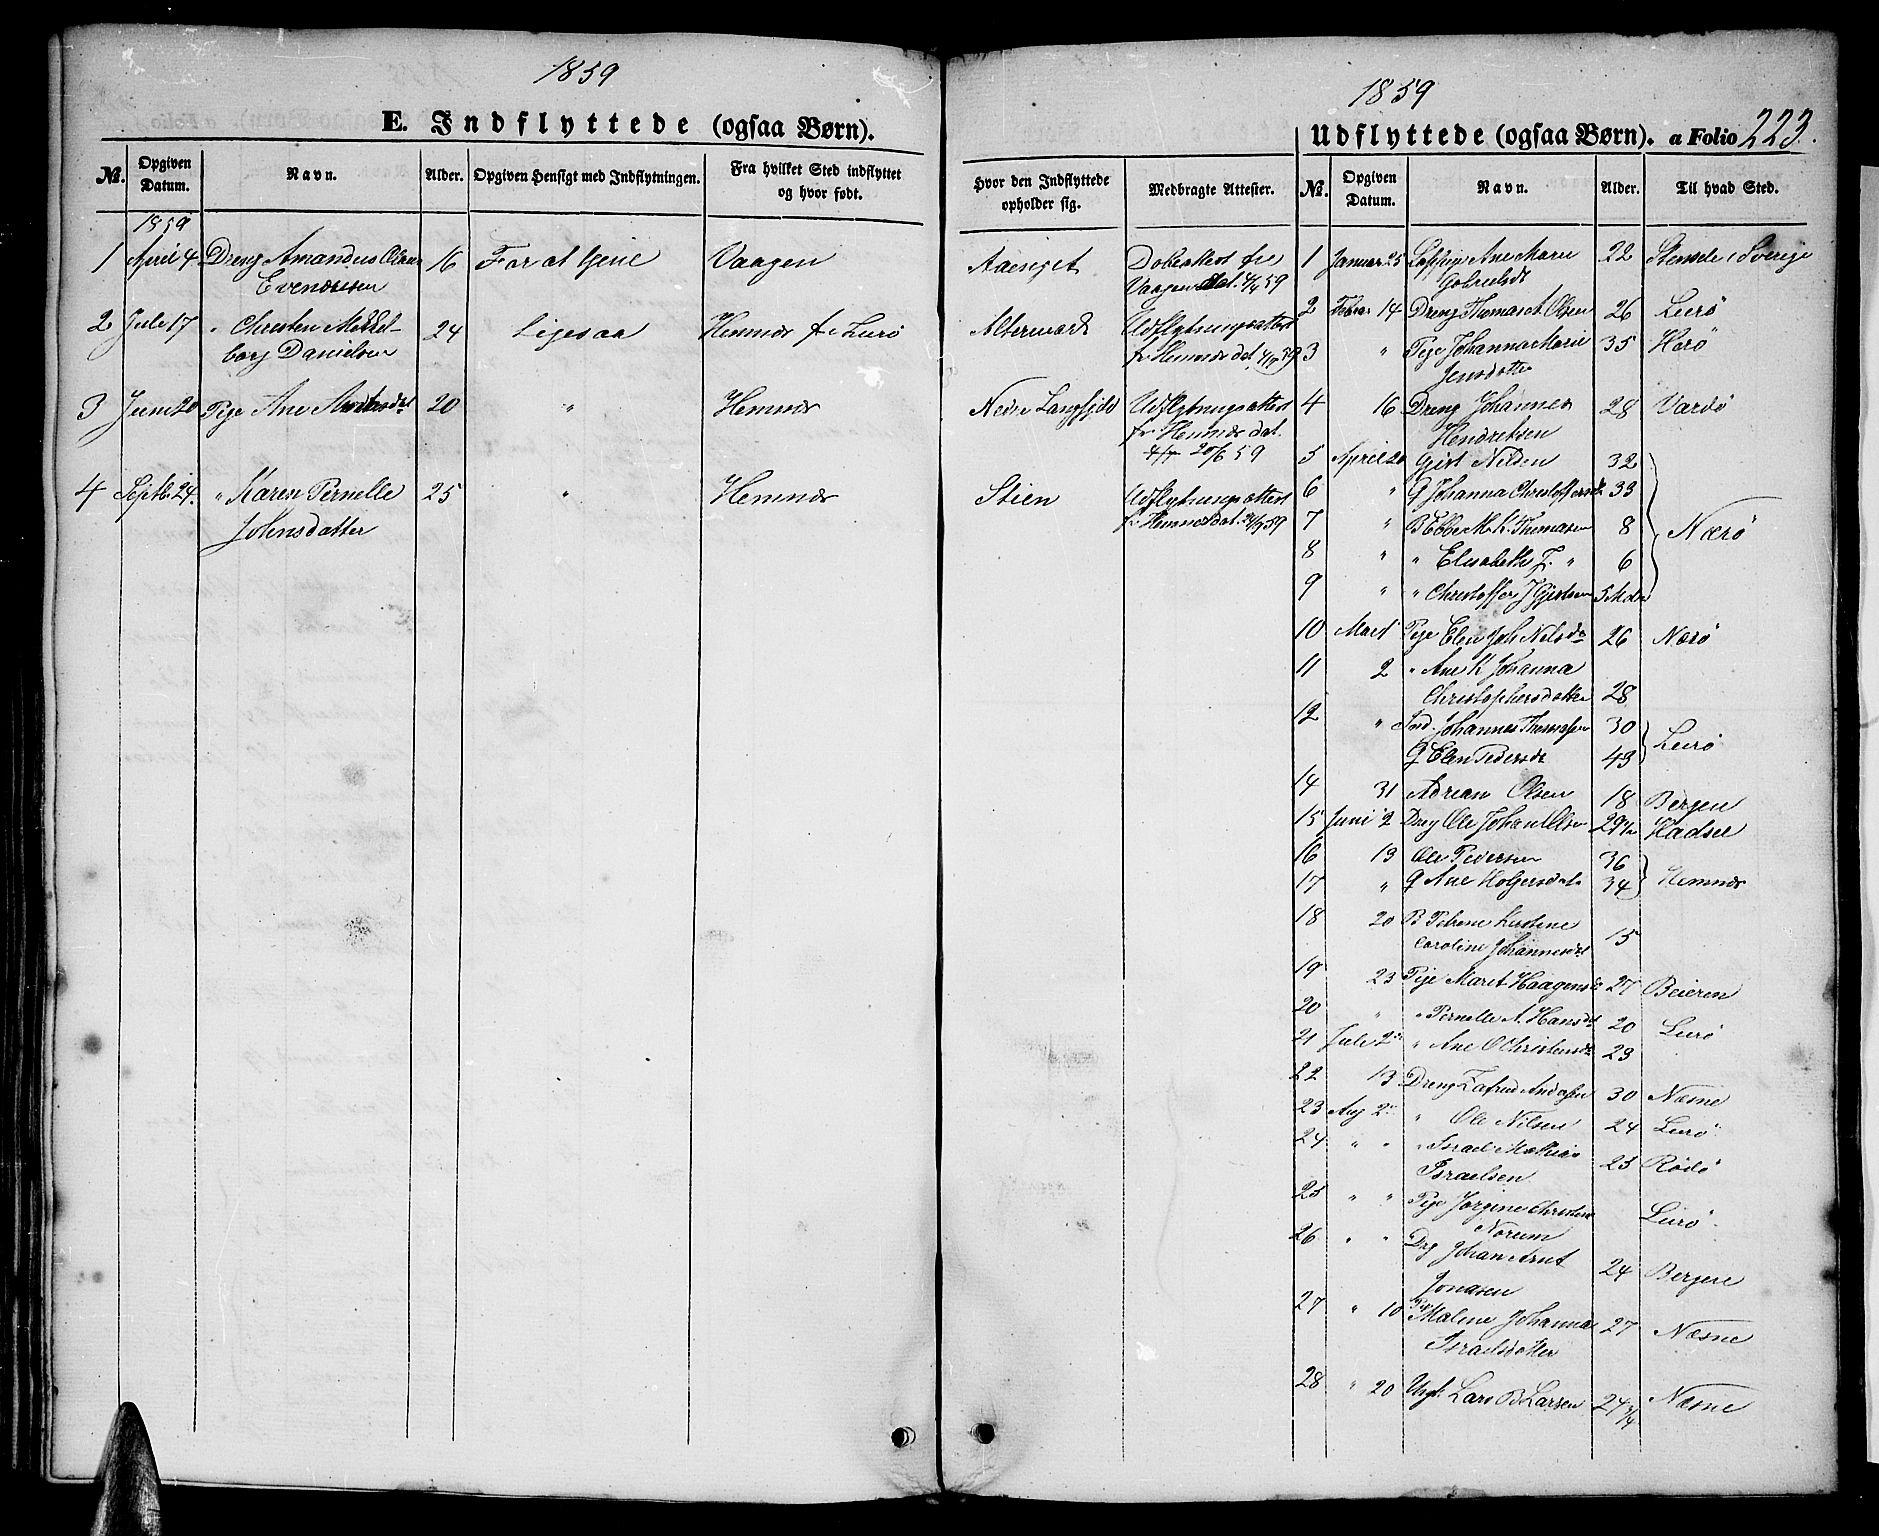 SAT, Ministerialprotokoller, klokkerbøker og fødselsregistre - Nordland, 827/L0414: Klokkerbok nr. 827C03, 1853-1865, s. 223